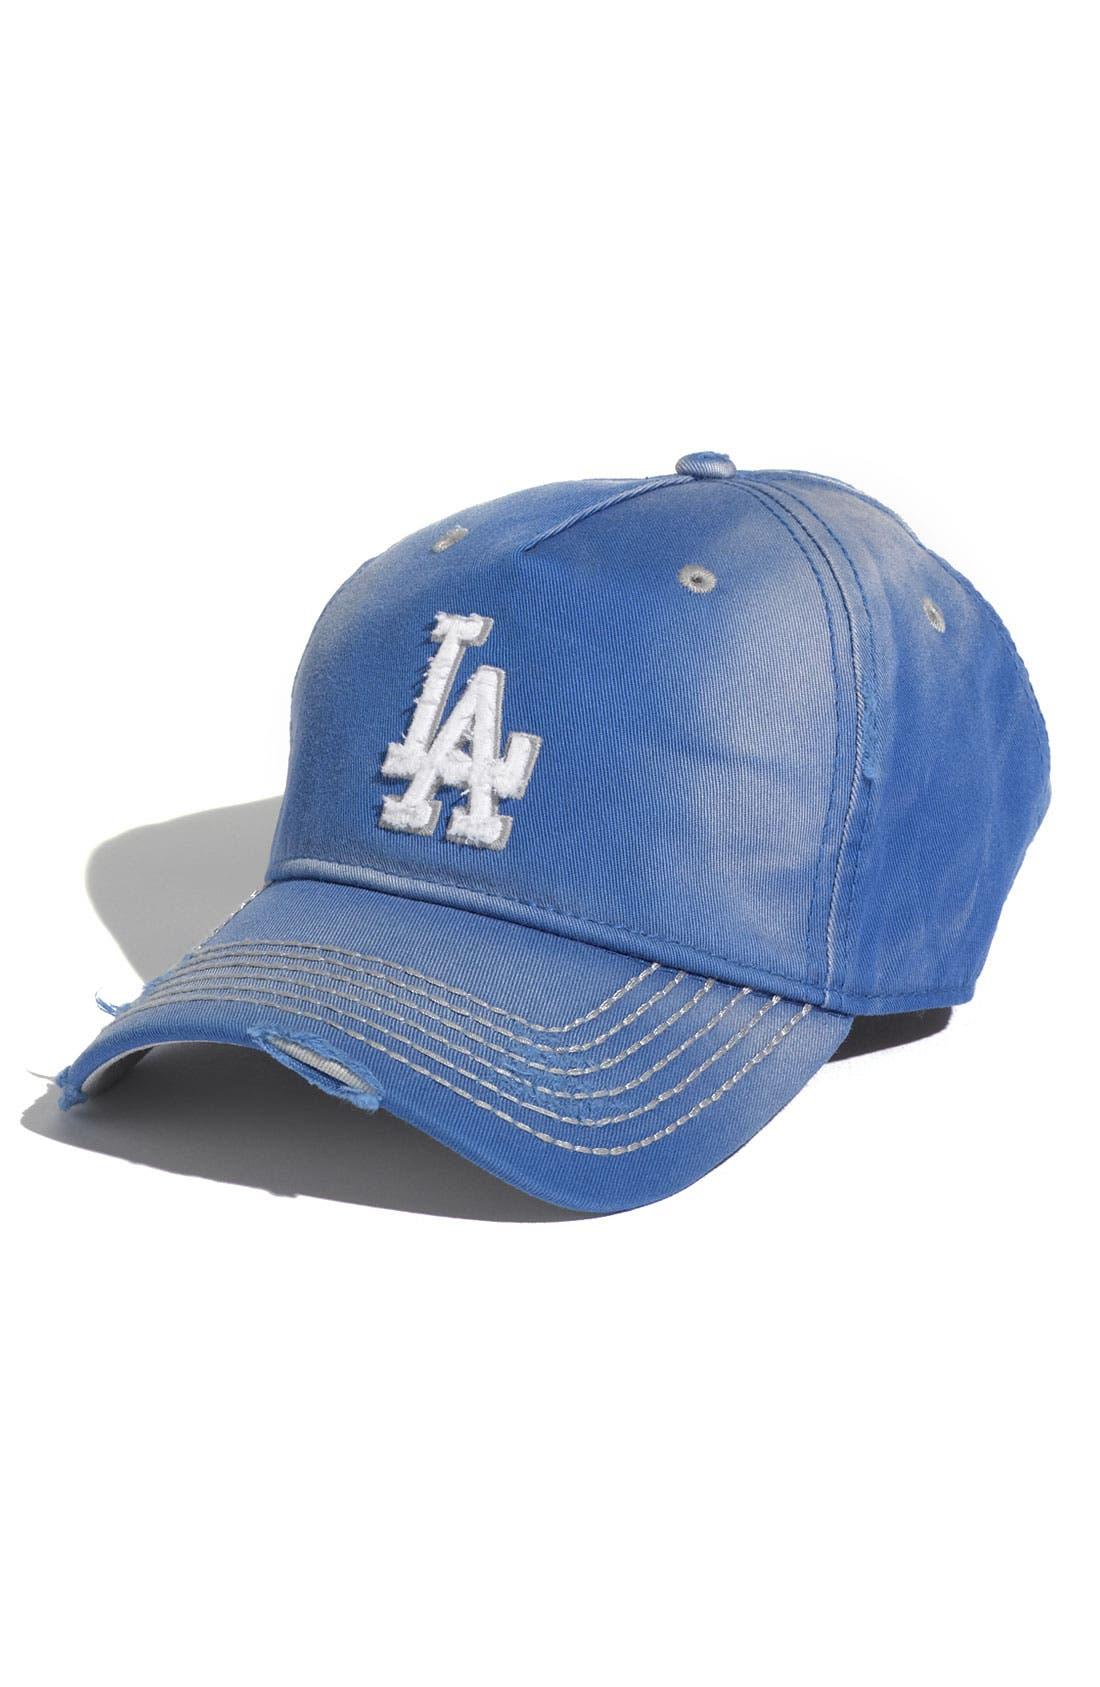 Alternate Image 1 Selected - Red Jacket 'Los Angeles Dodgers' Distressed Cap